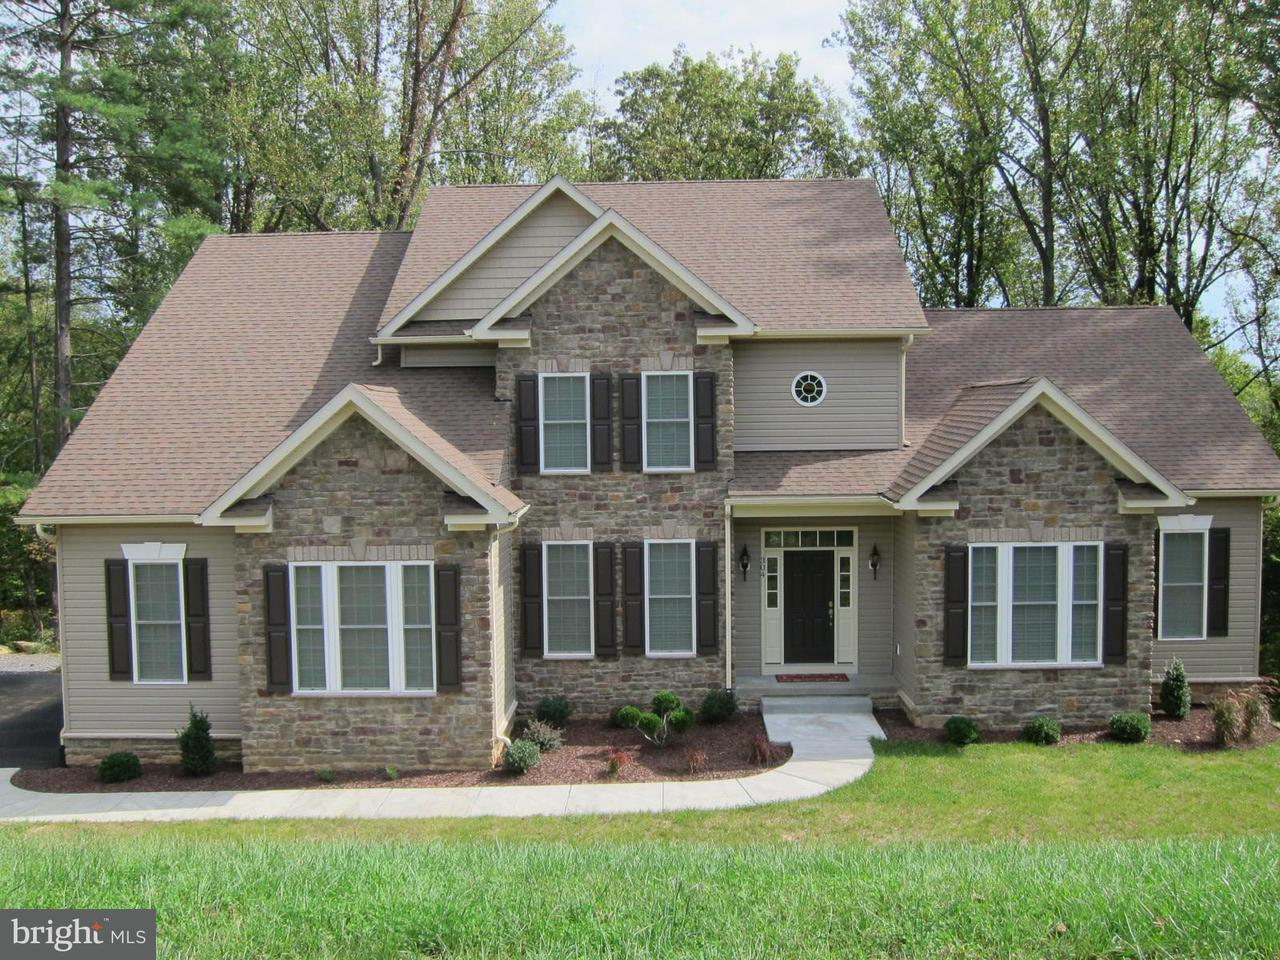 Vivienda unifamiliar por un Venta en 1916 Parkwood Drive 1916 Parkwood Drive Forest Hill, Maryland 21050 Estados Unidos